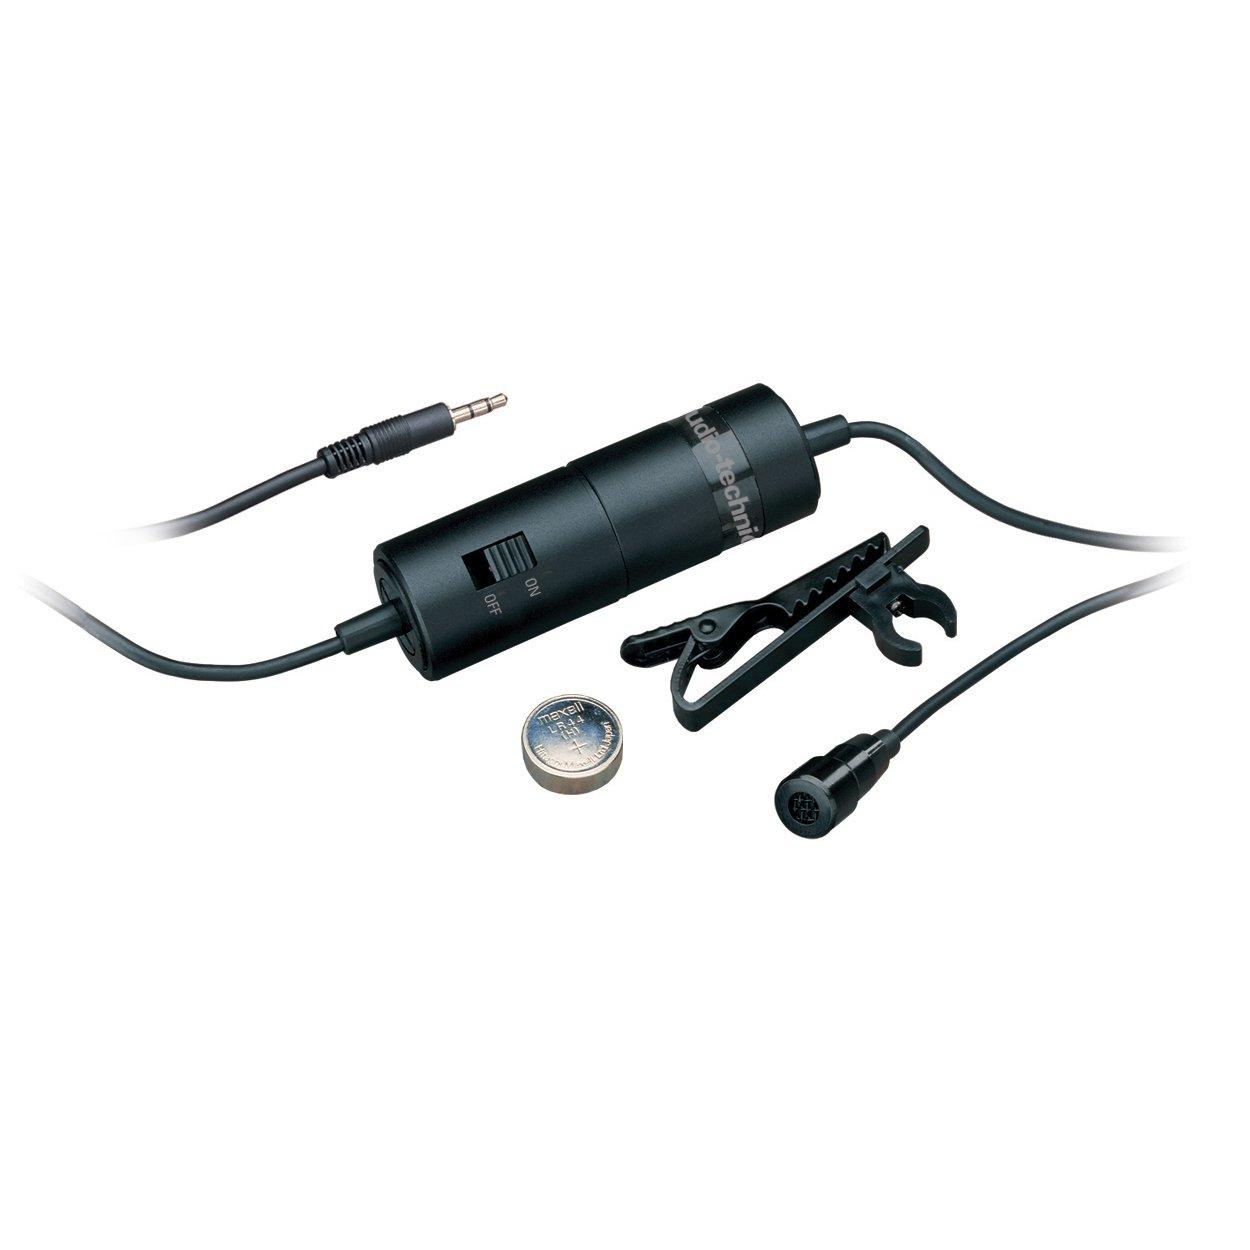 Audio-Technica ATR3350 Omnidirectional Lapel Microphone